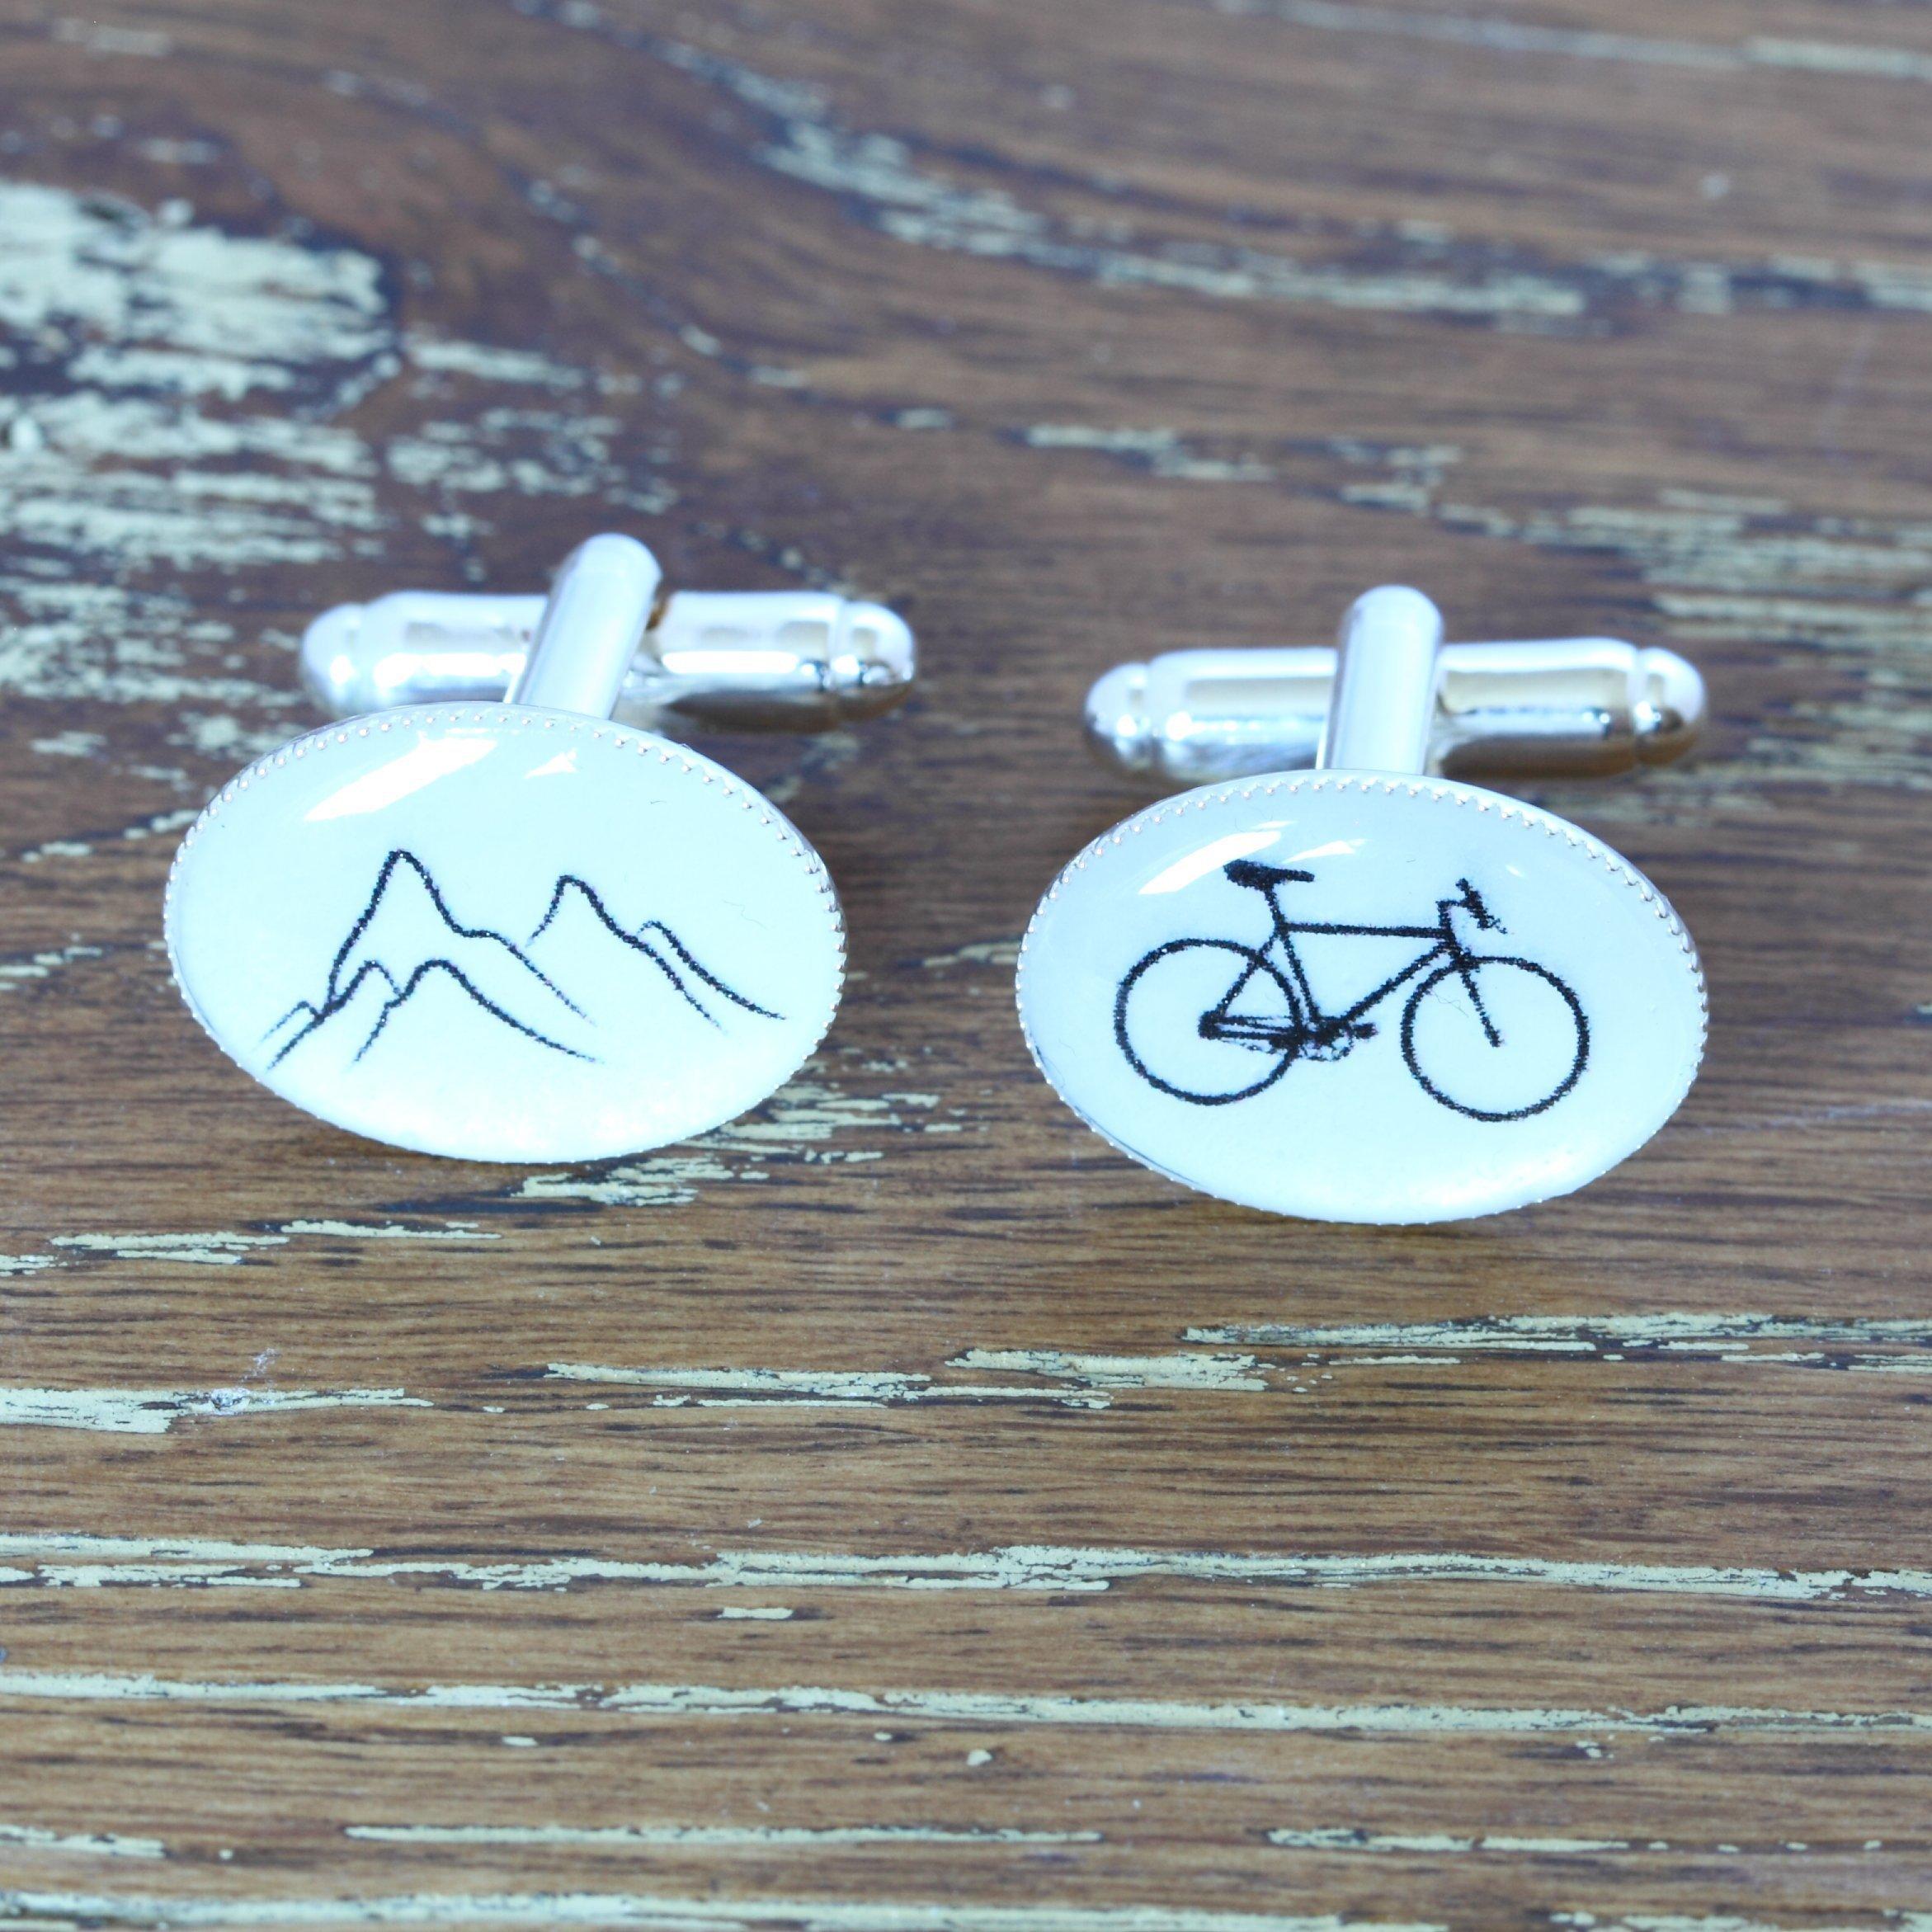 Mountain Bike Cufflinks, Bicycle cufflinks, Bike cufflinks, Mountain Bike Cufflinks, bike gifts, Bike Cuff Links, cycling gifts, Silver cufflinks,